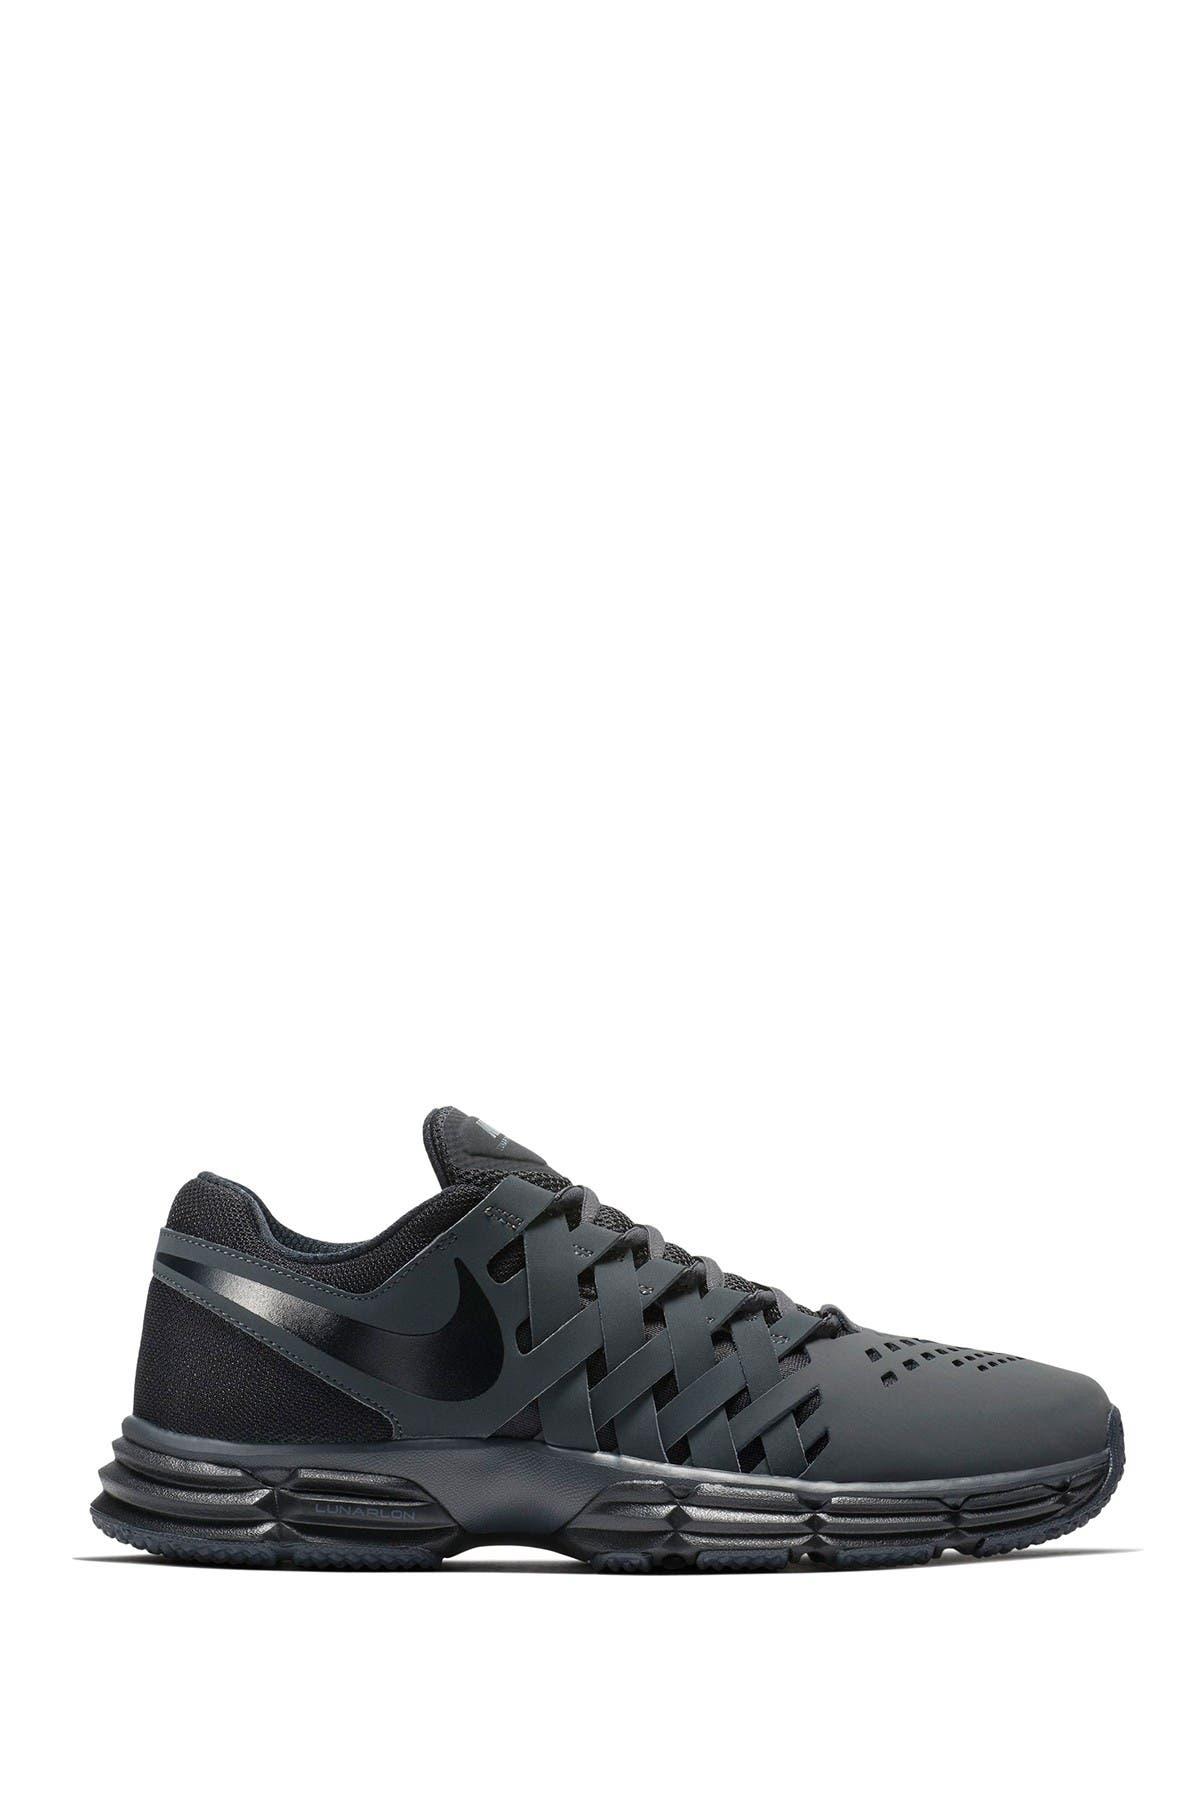 Image of Nike Lunar Fingertrap Sneaker